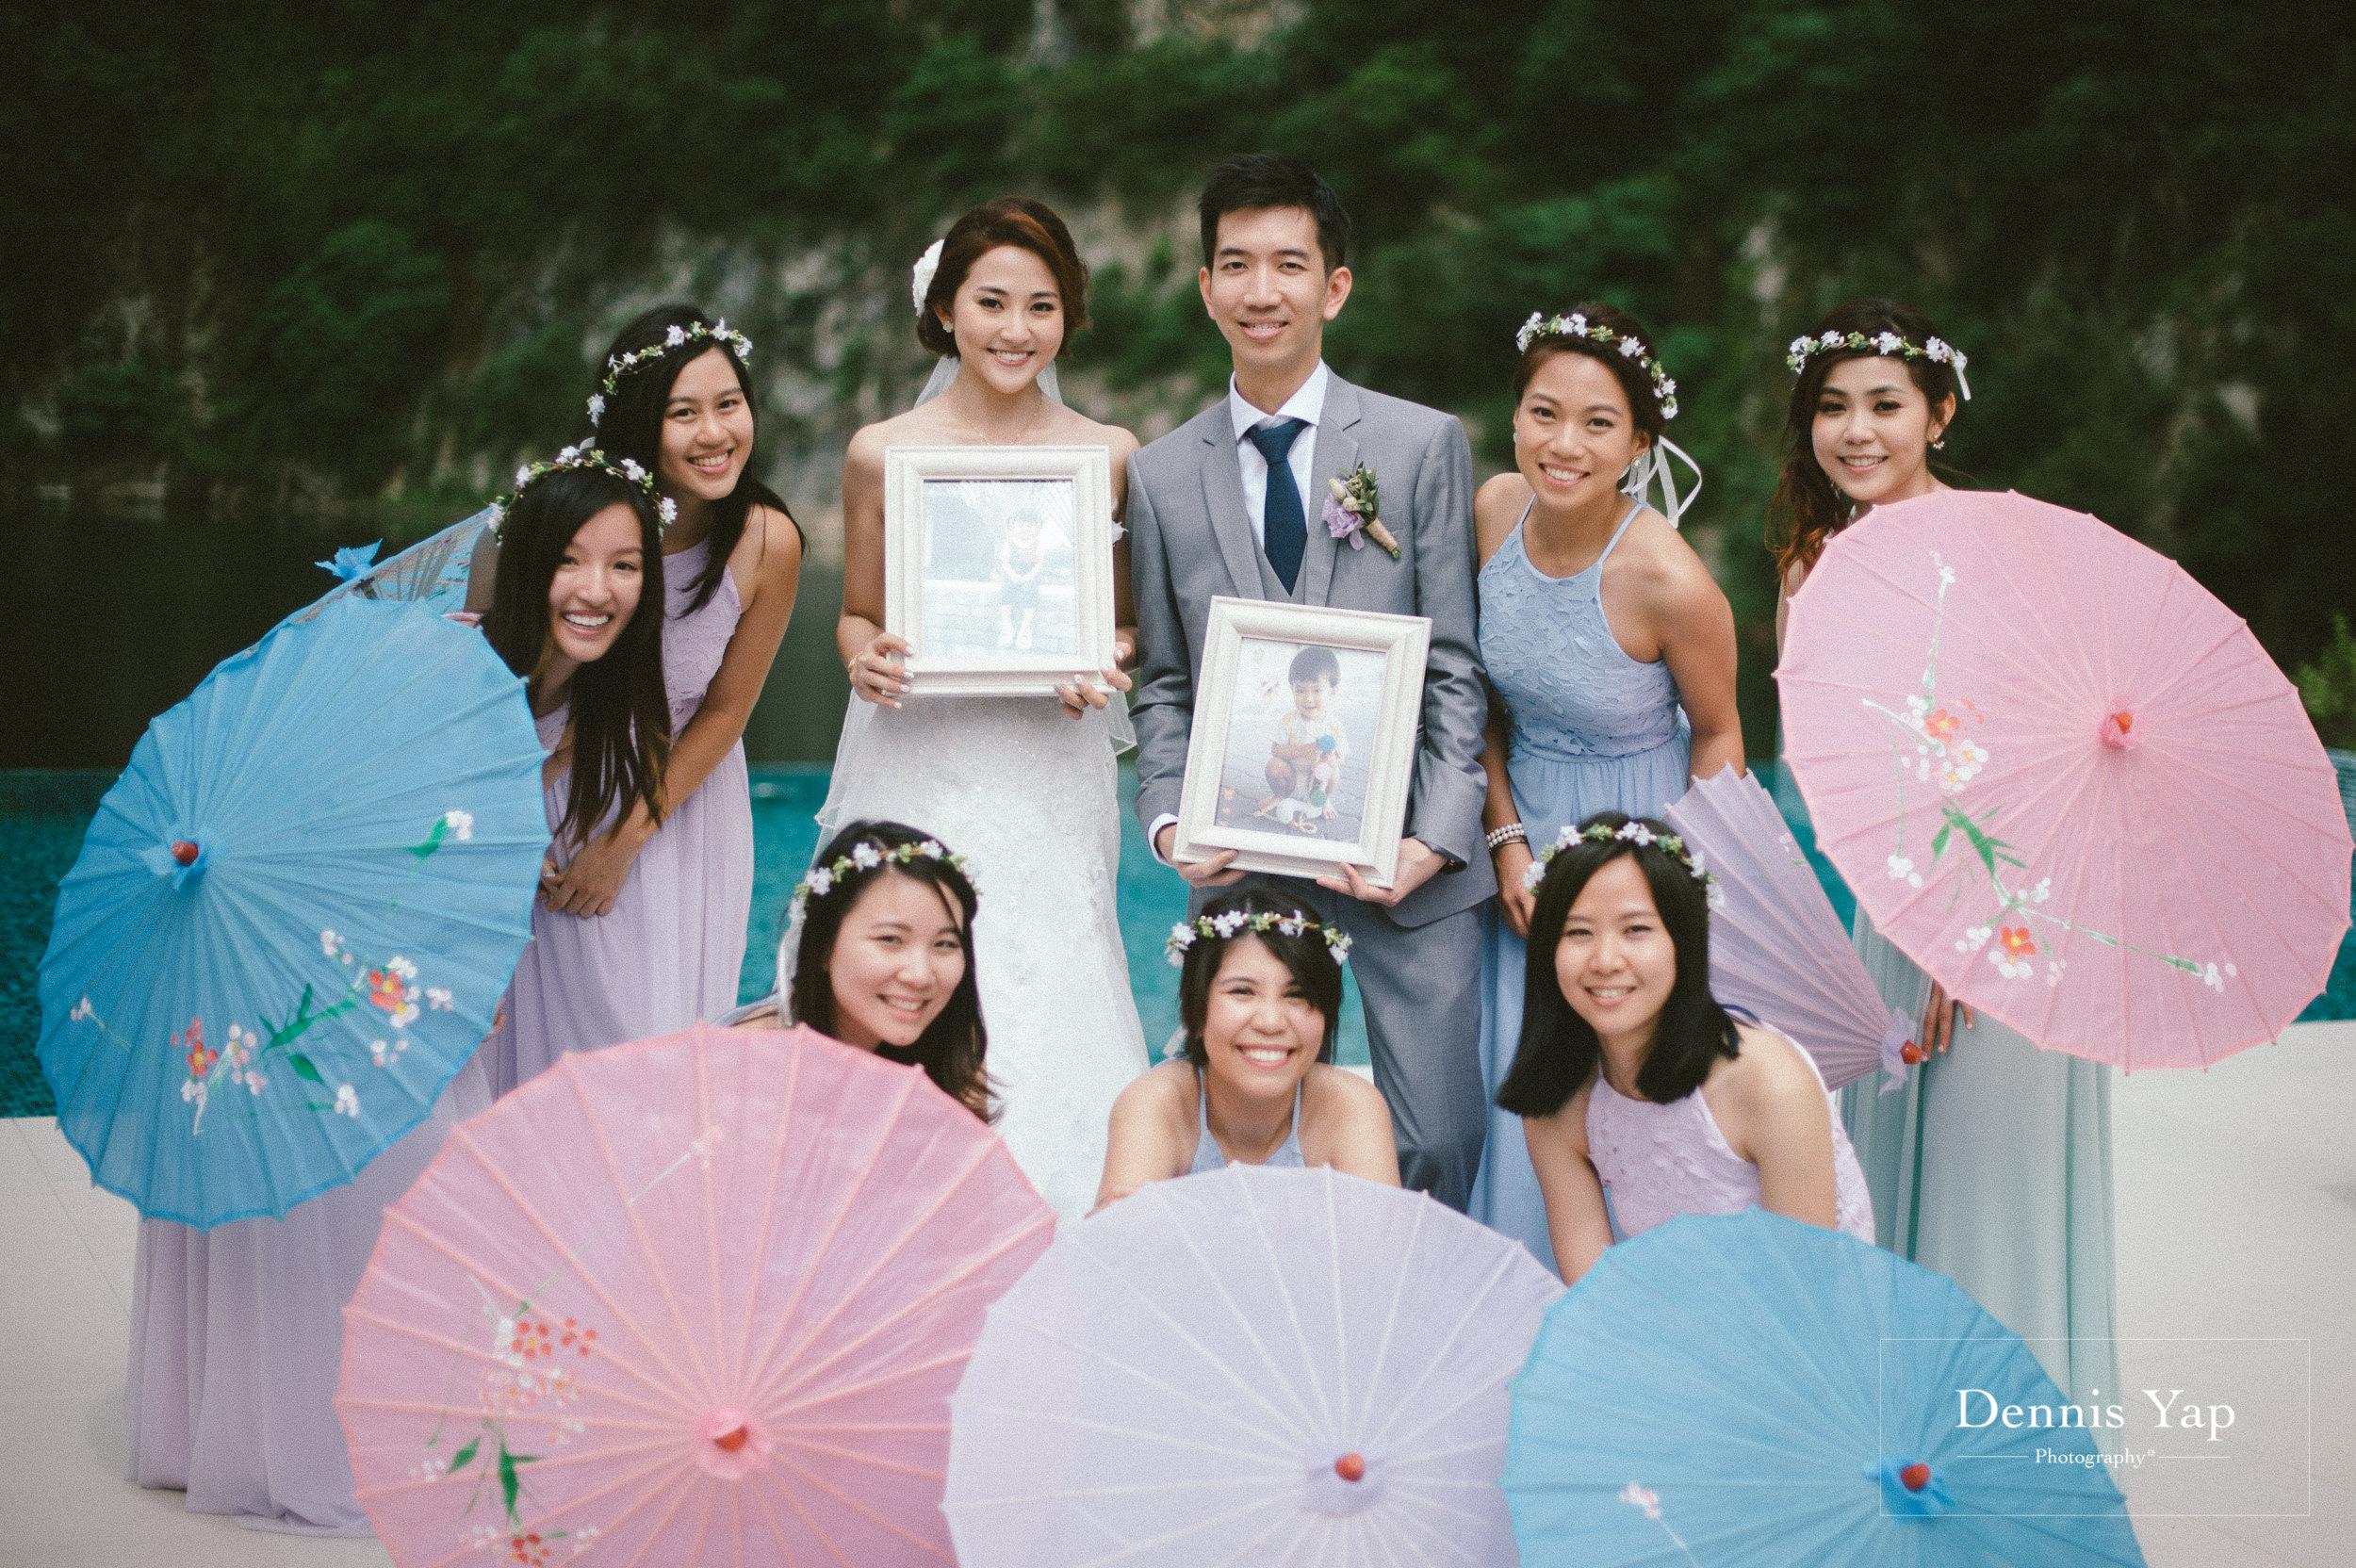 jamie hann wedding day gate crash garden wedding dennis yap photography traditional chinese tea ceremony-37.jpg